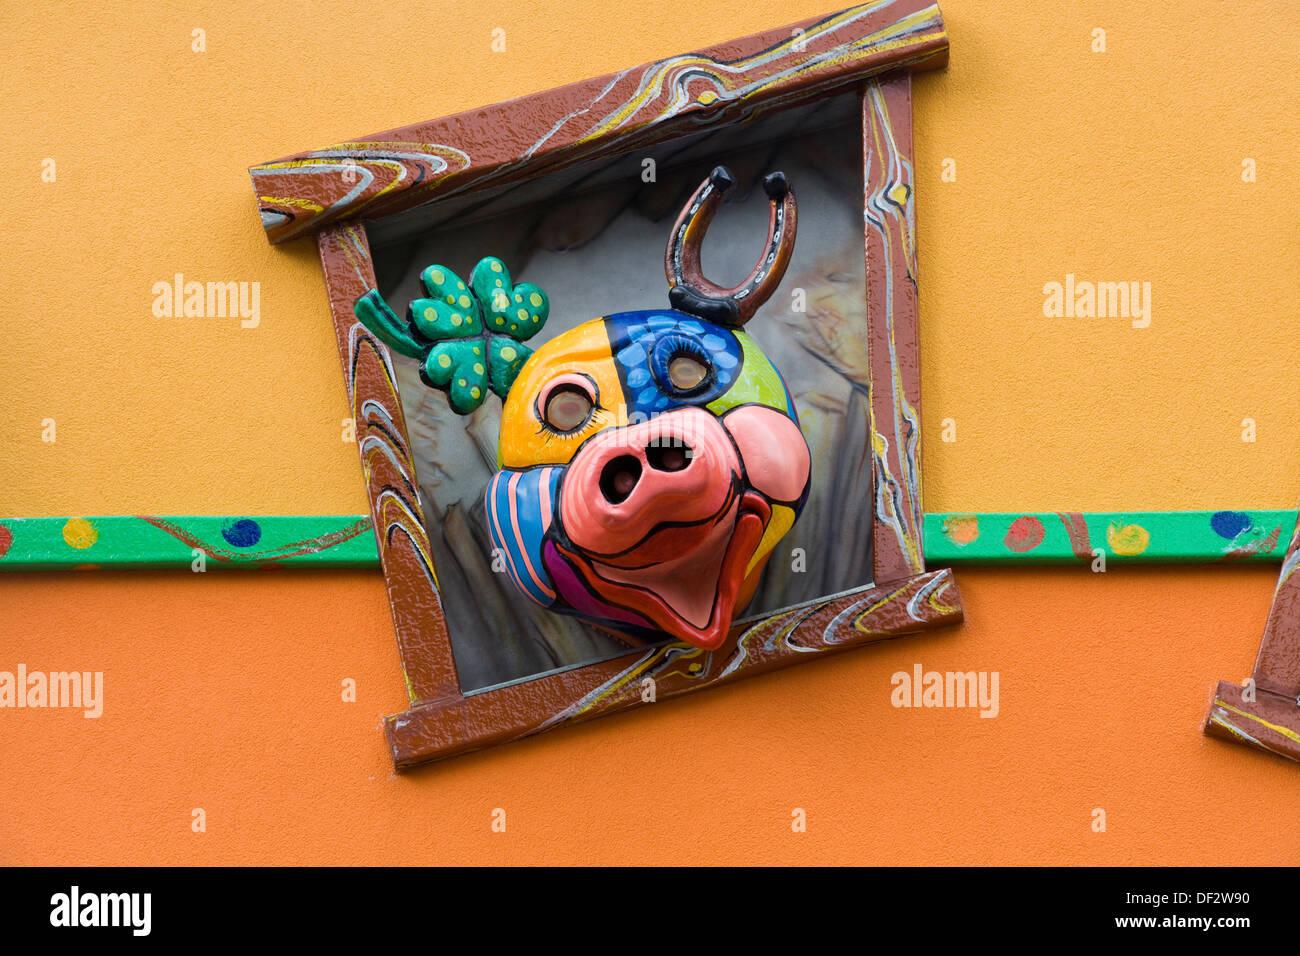 The Wiener Prater  Wurstelprater amusement park Vienna - Stock Image